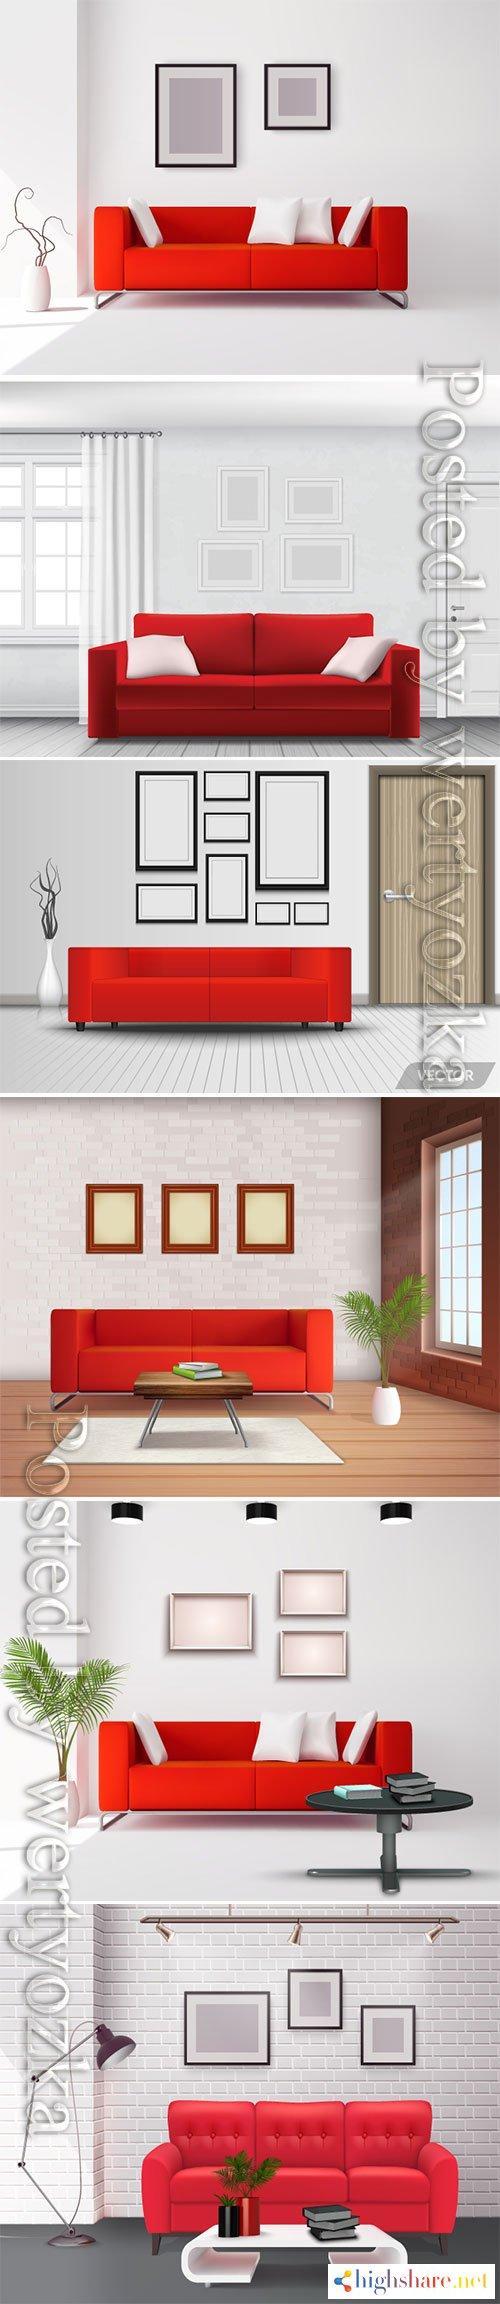 realistic home interior vector template 2 5f3feabdb35f5 - Realistic home interior vector template # 2